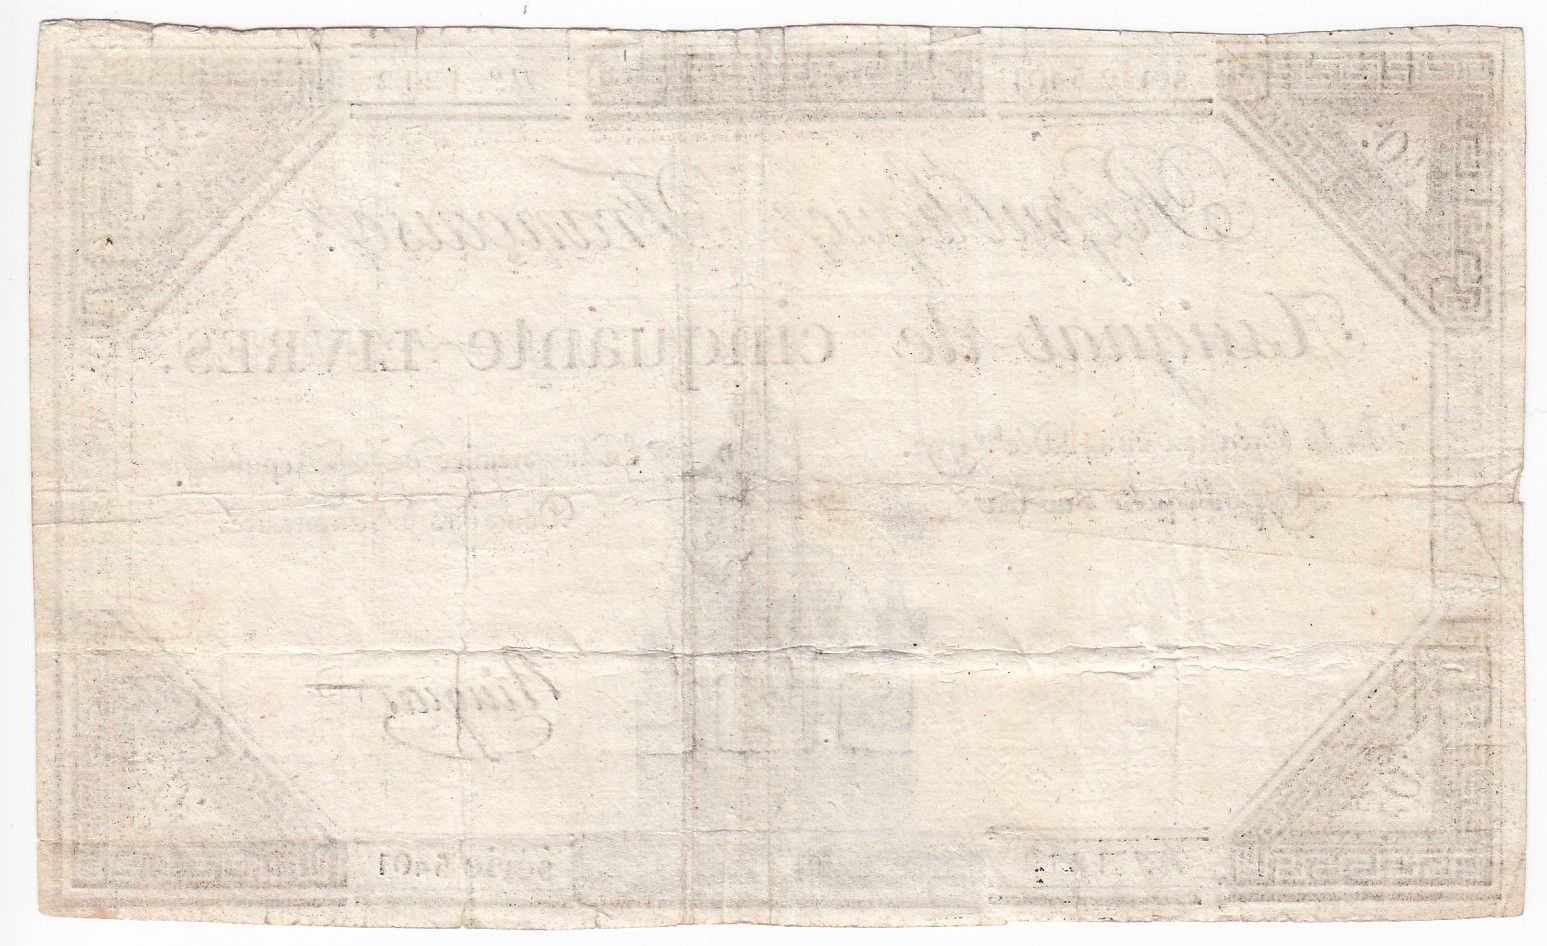 France 50 Livres France seated - 14-12-1792 - Sign. Ringuet - VF